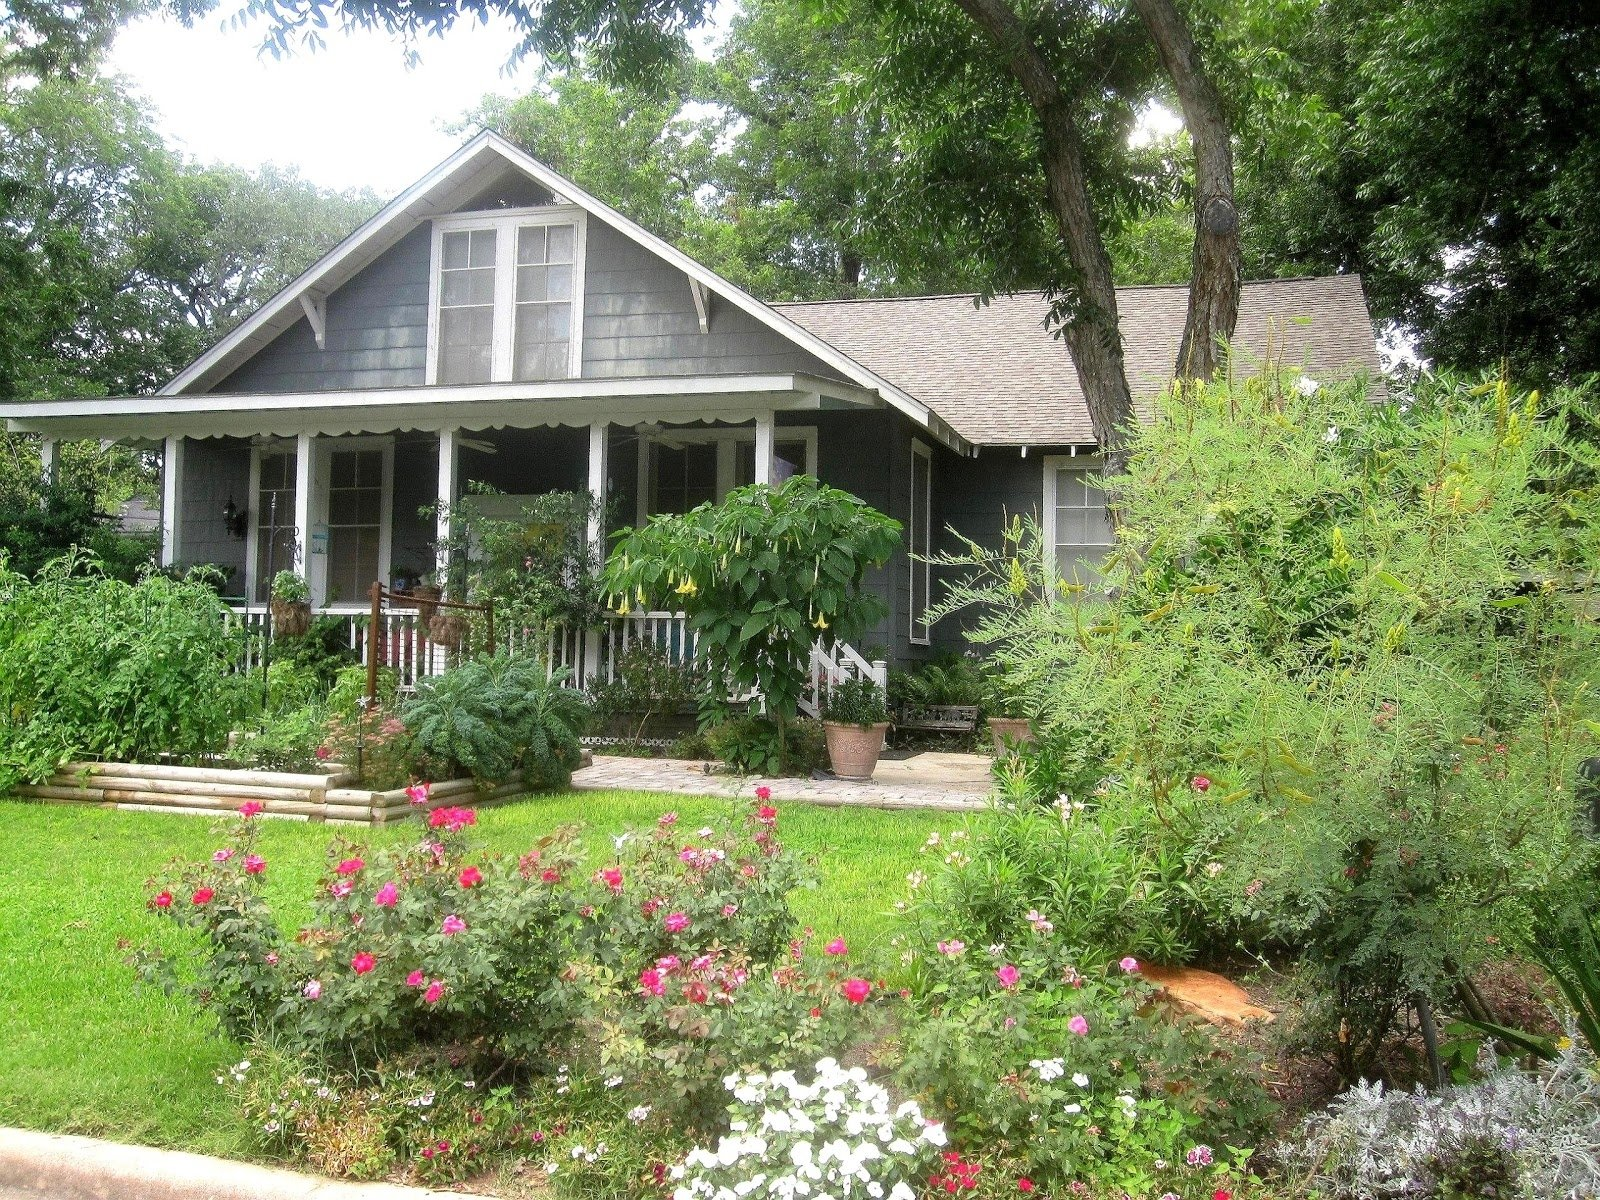 10 Fantastic Cottage Landscaping Ideas For Front Yard front yard front yard shrubs for and garden ideas pleasant cottage